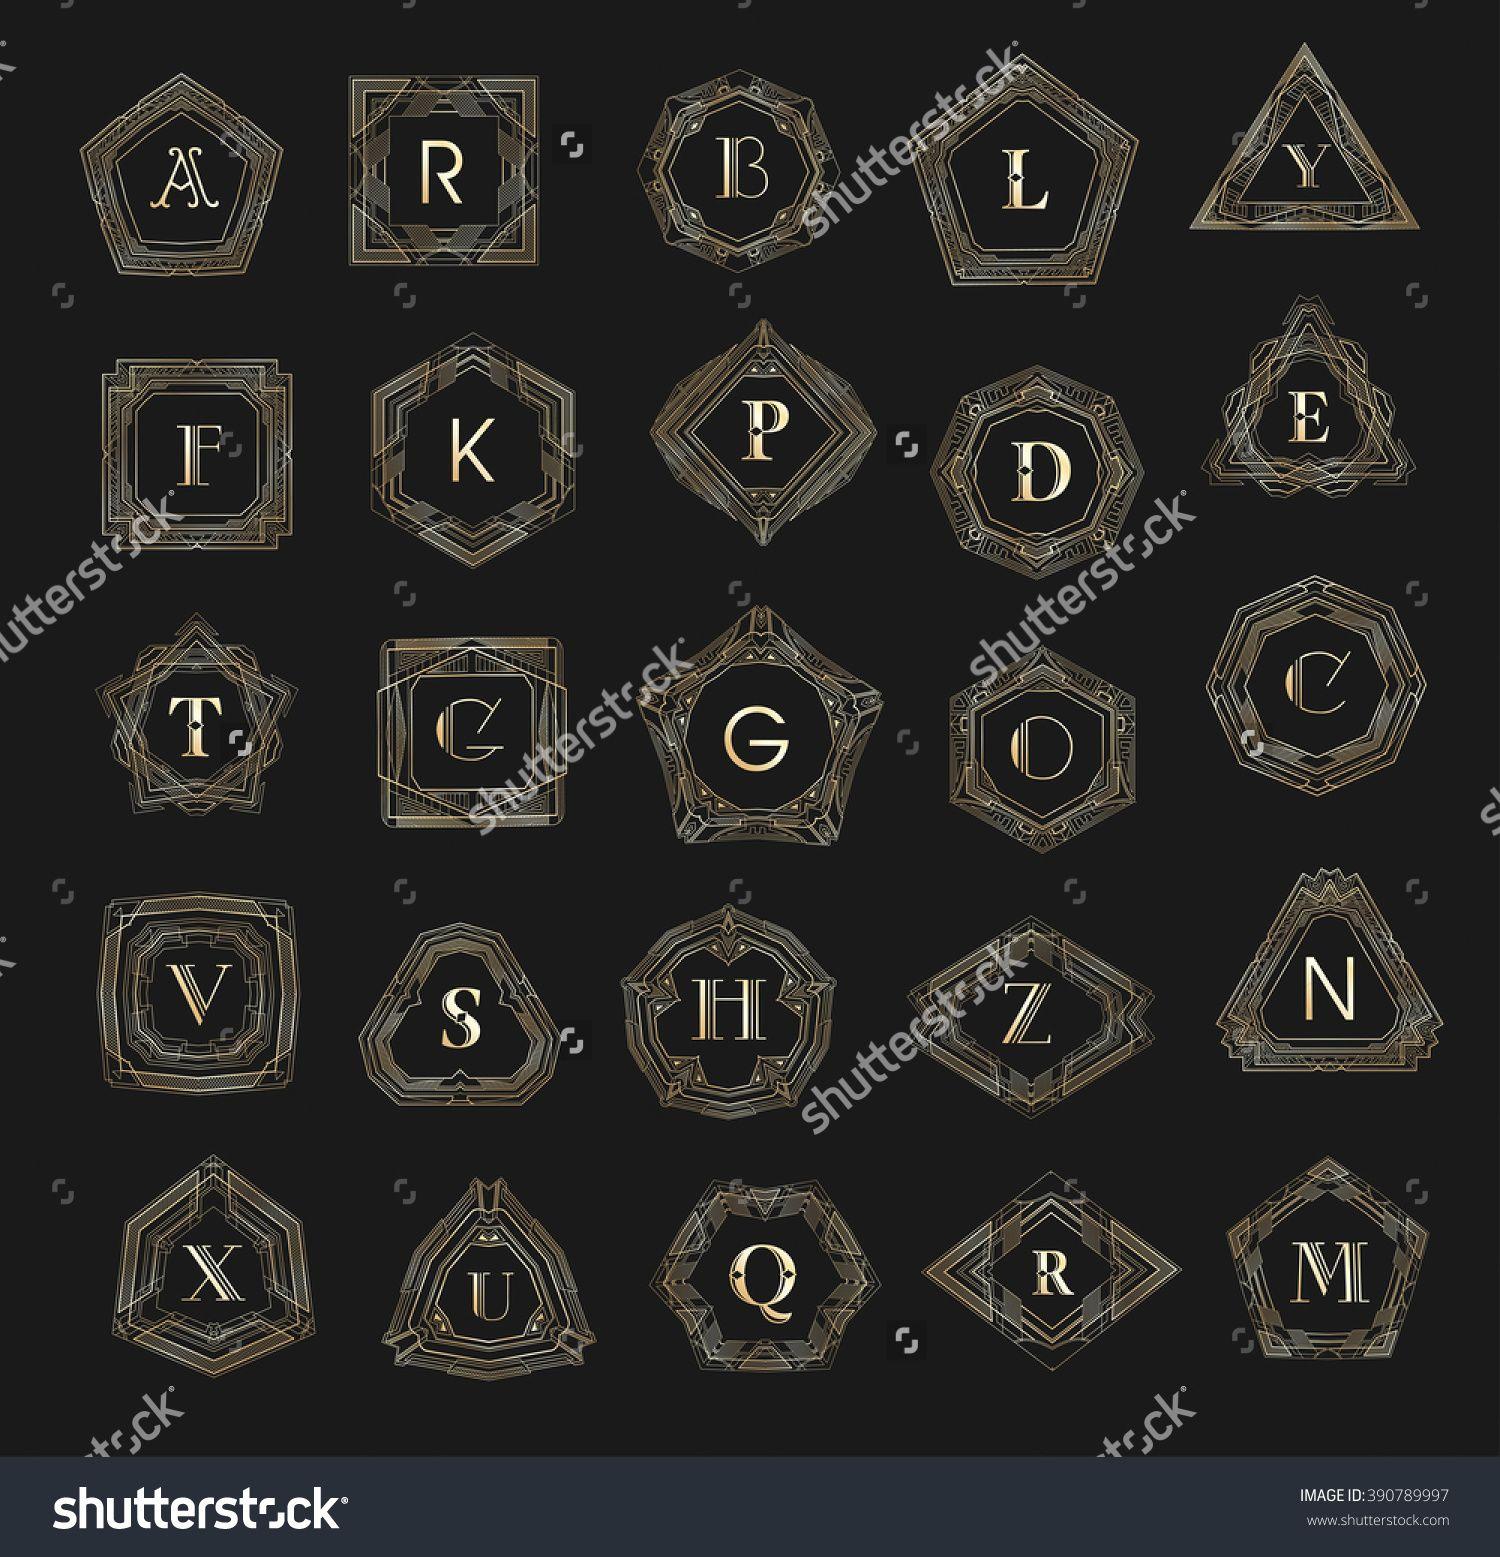 Monogram logo template with calligraphic elegant ornament identity monogram logo template with calligraphic elegant ornament identity design with letter pd altavistaventures Images